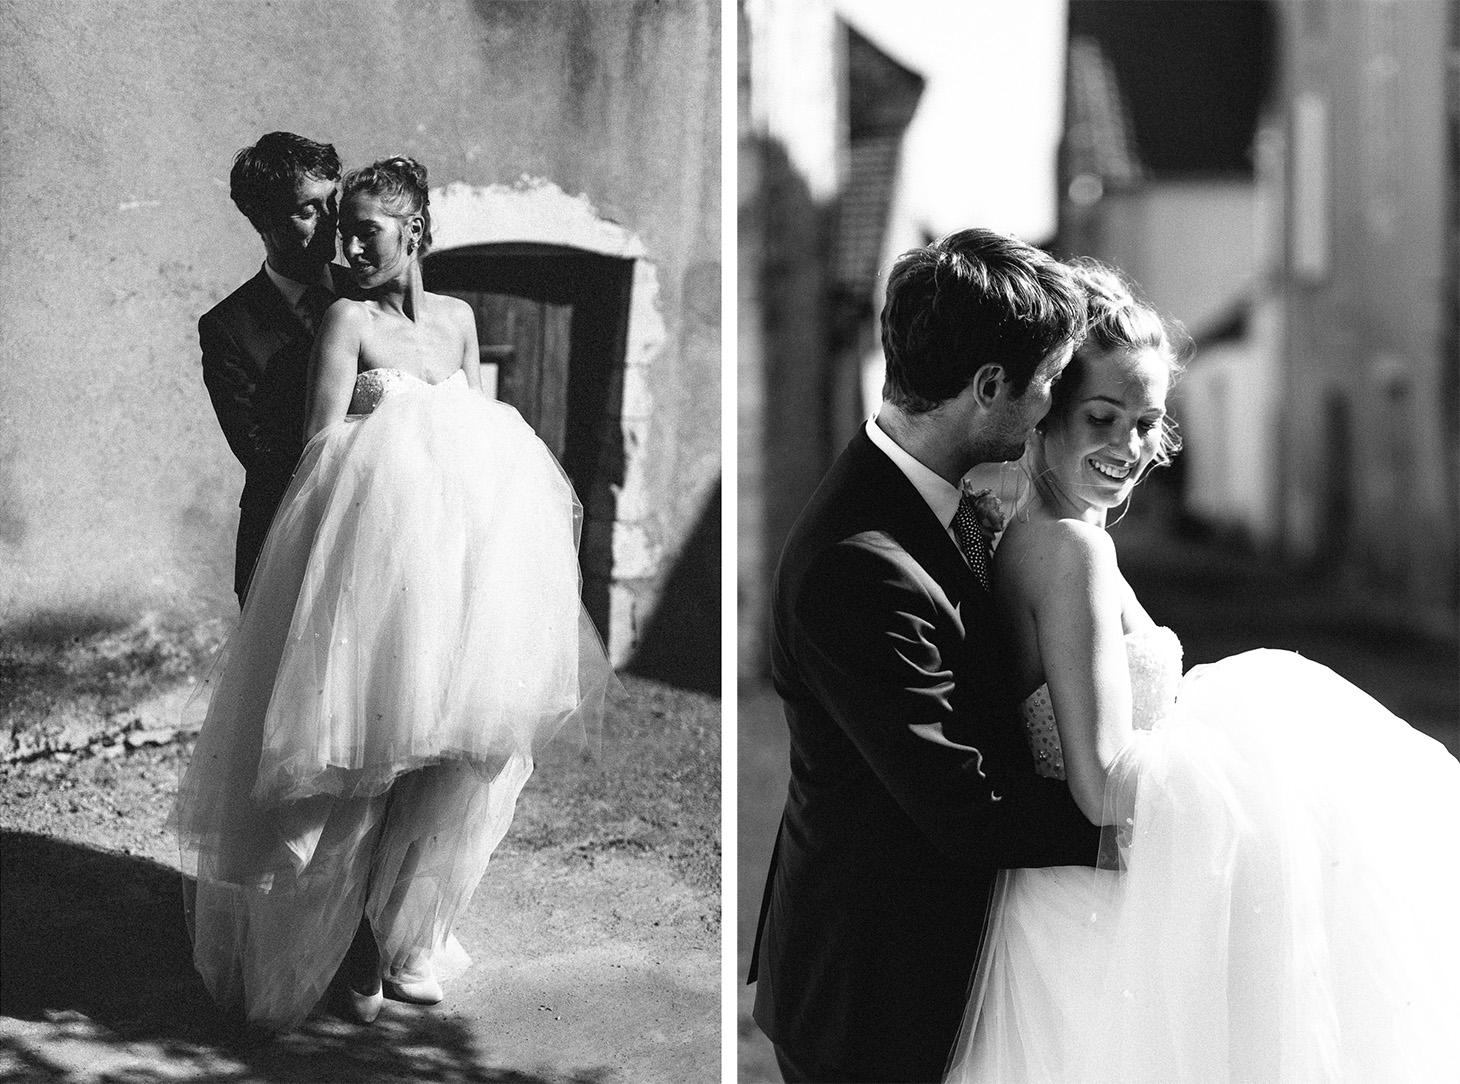 bourgogne_wedding_photographer_chateau_pommard-047 copie